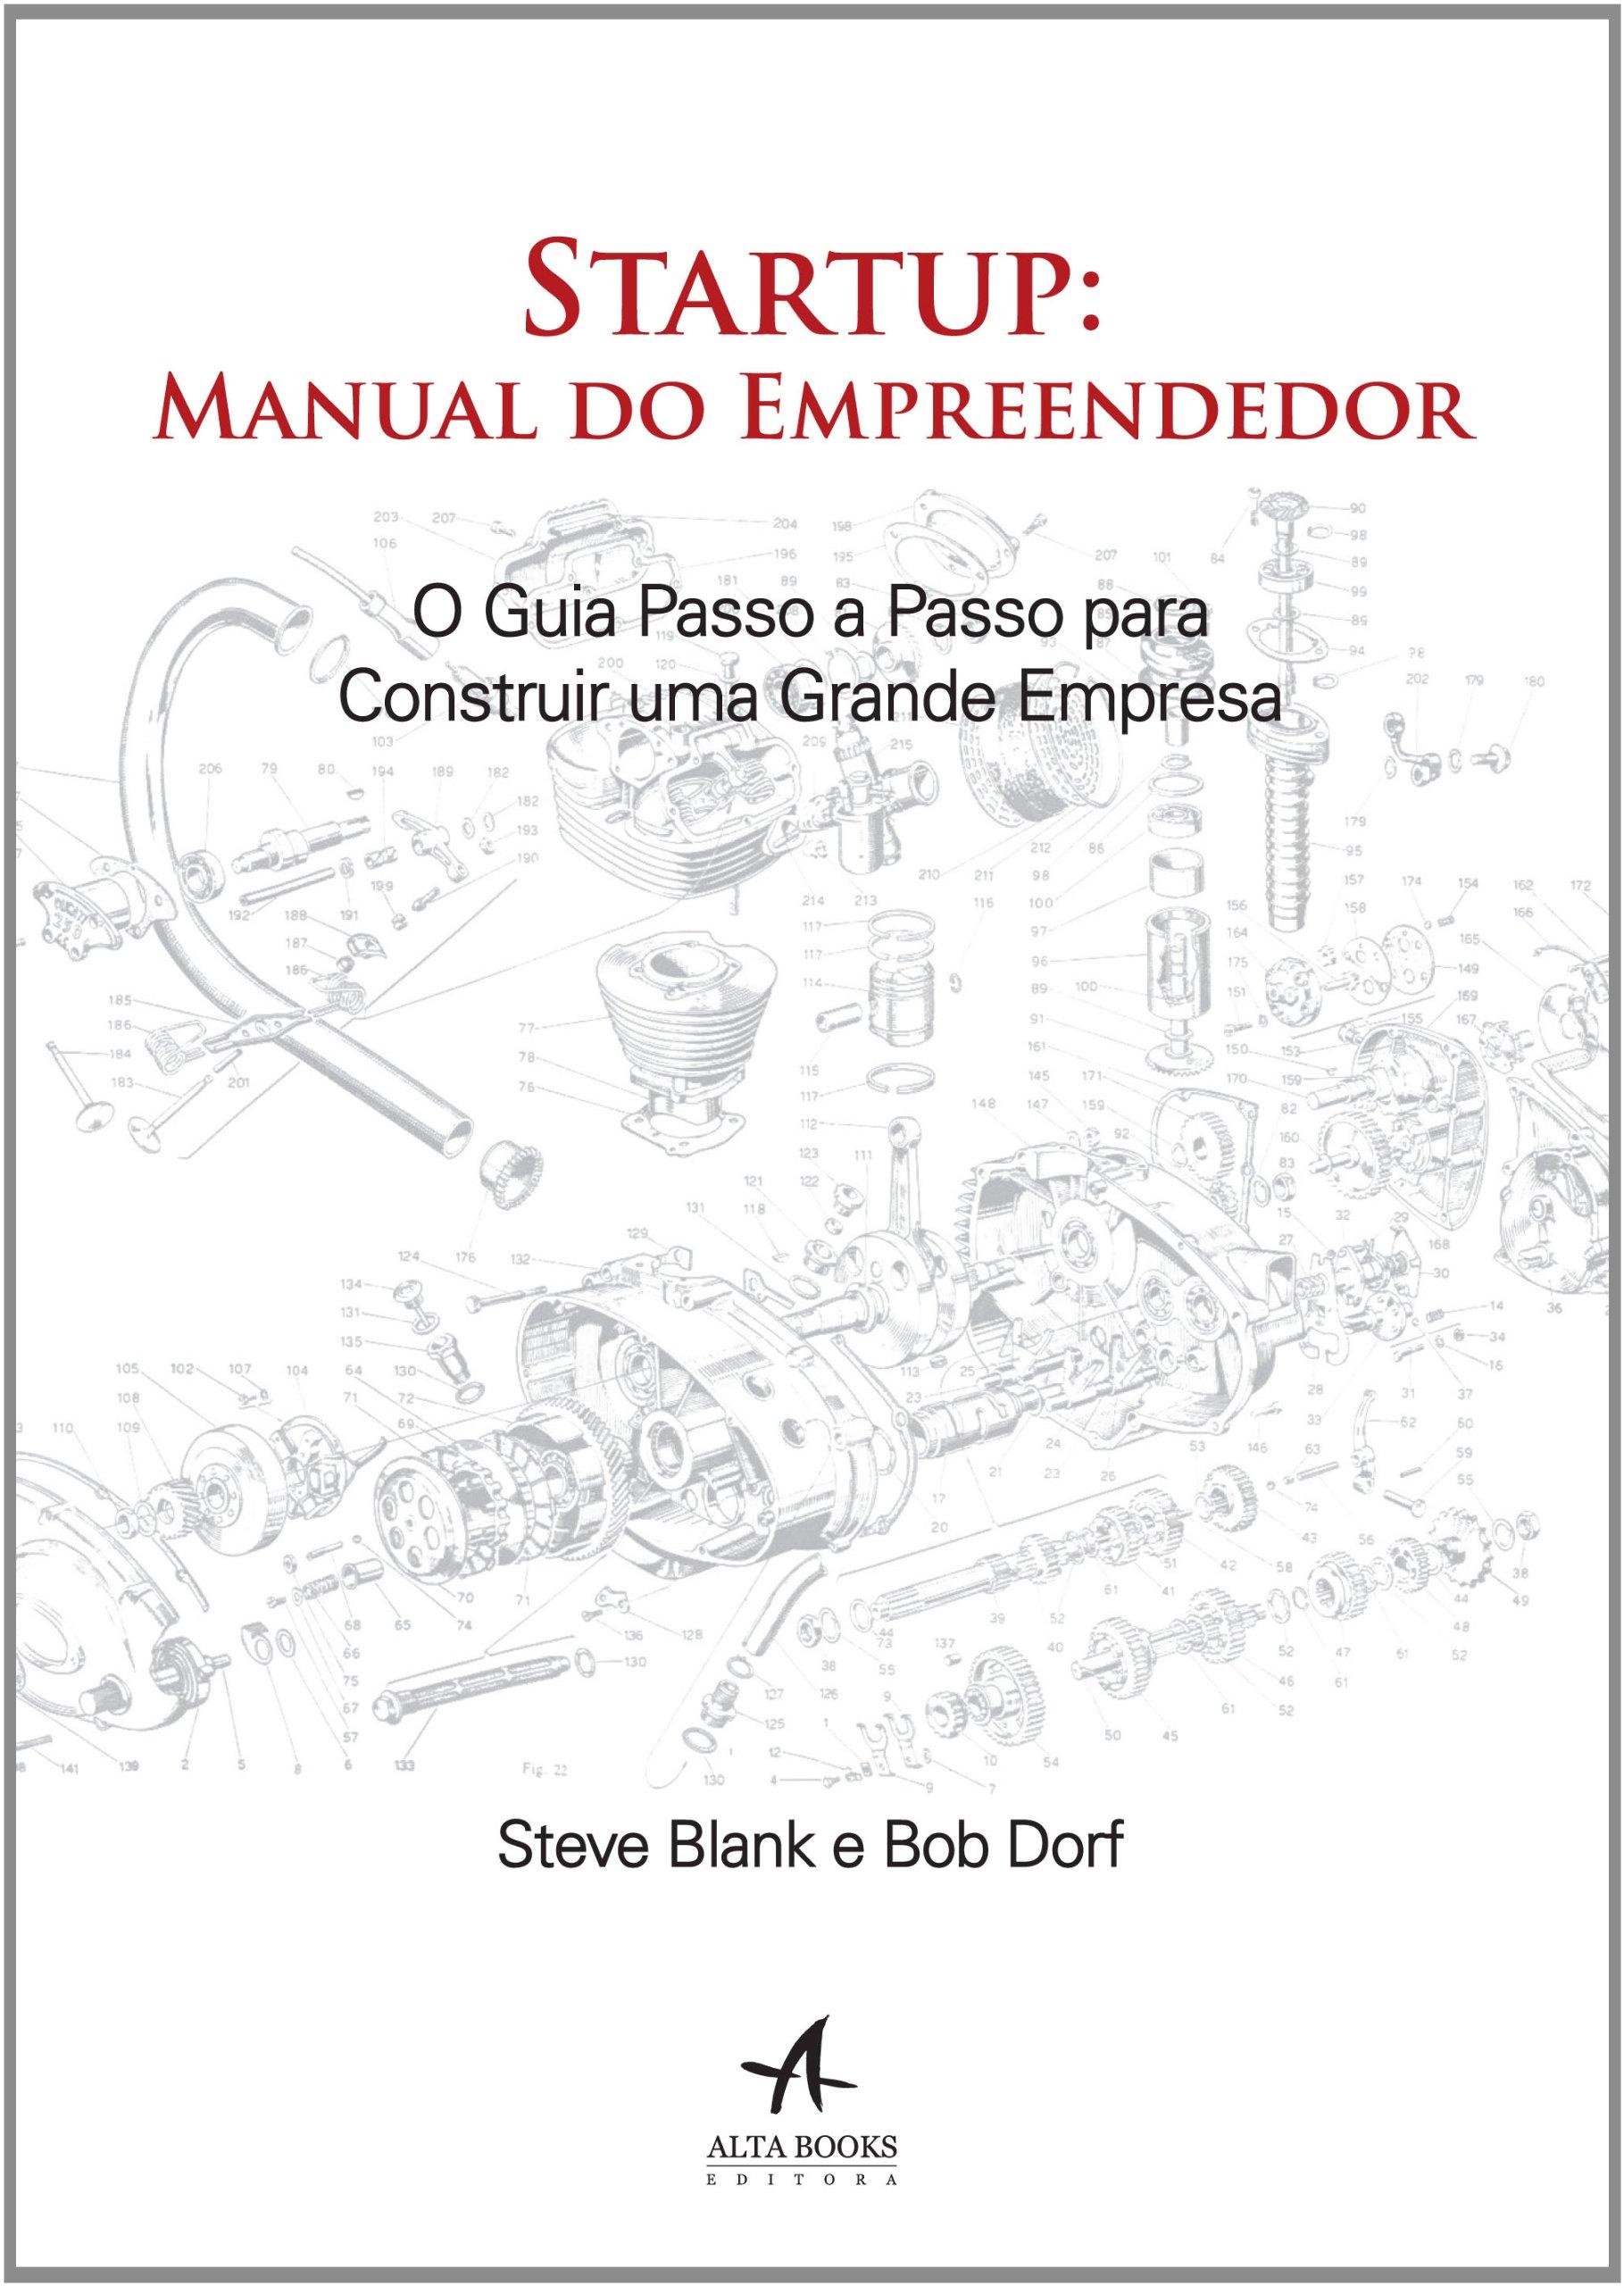 Livro startup: manual do empreendedor brochura | cia dos livros.